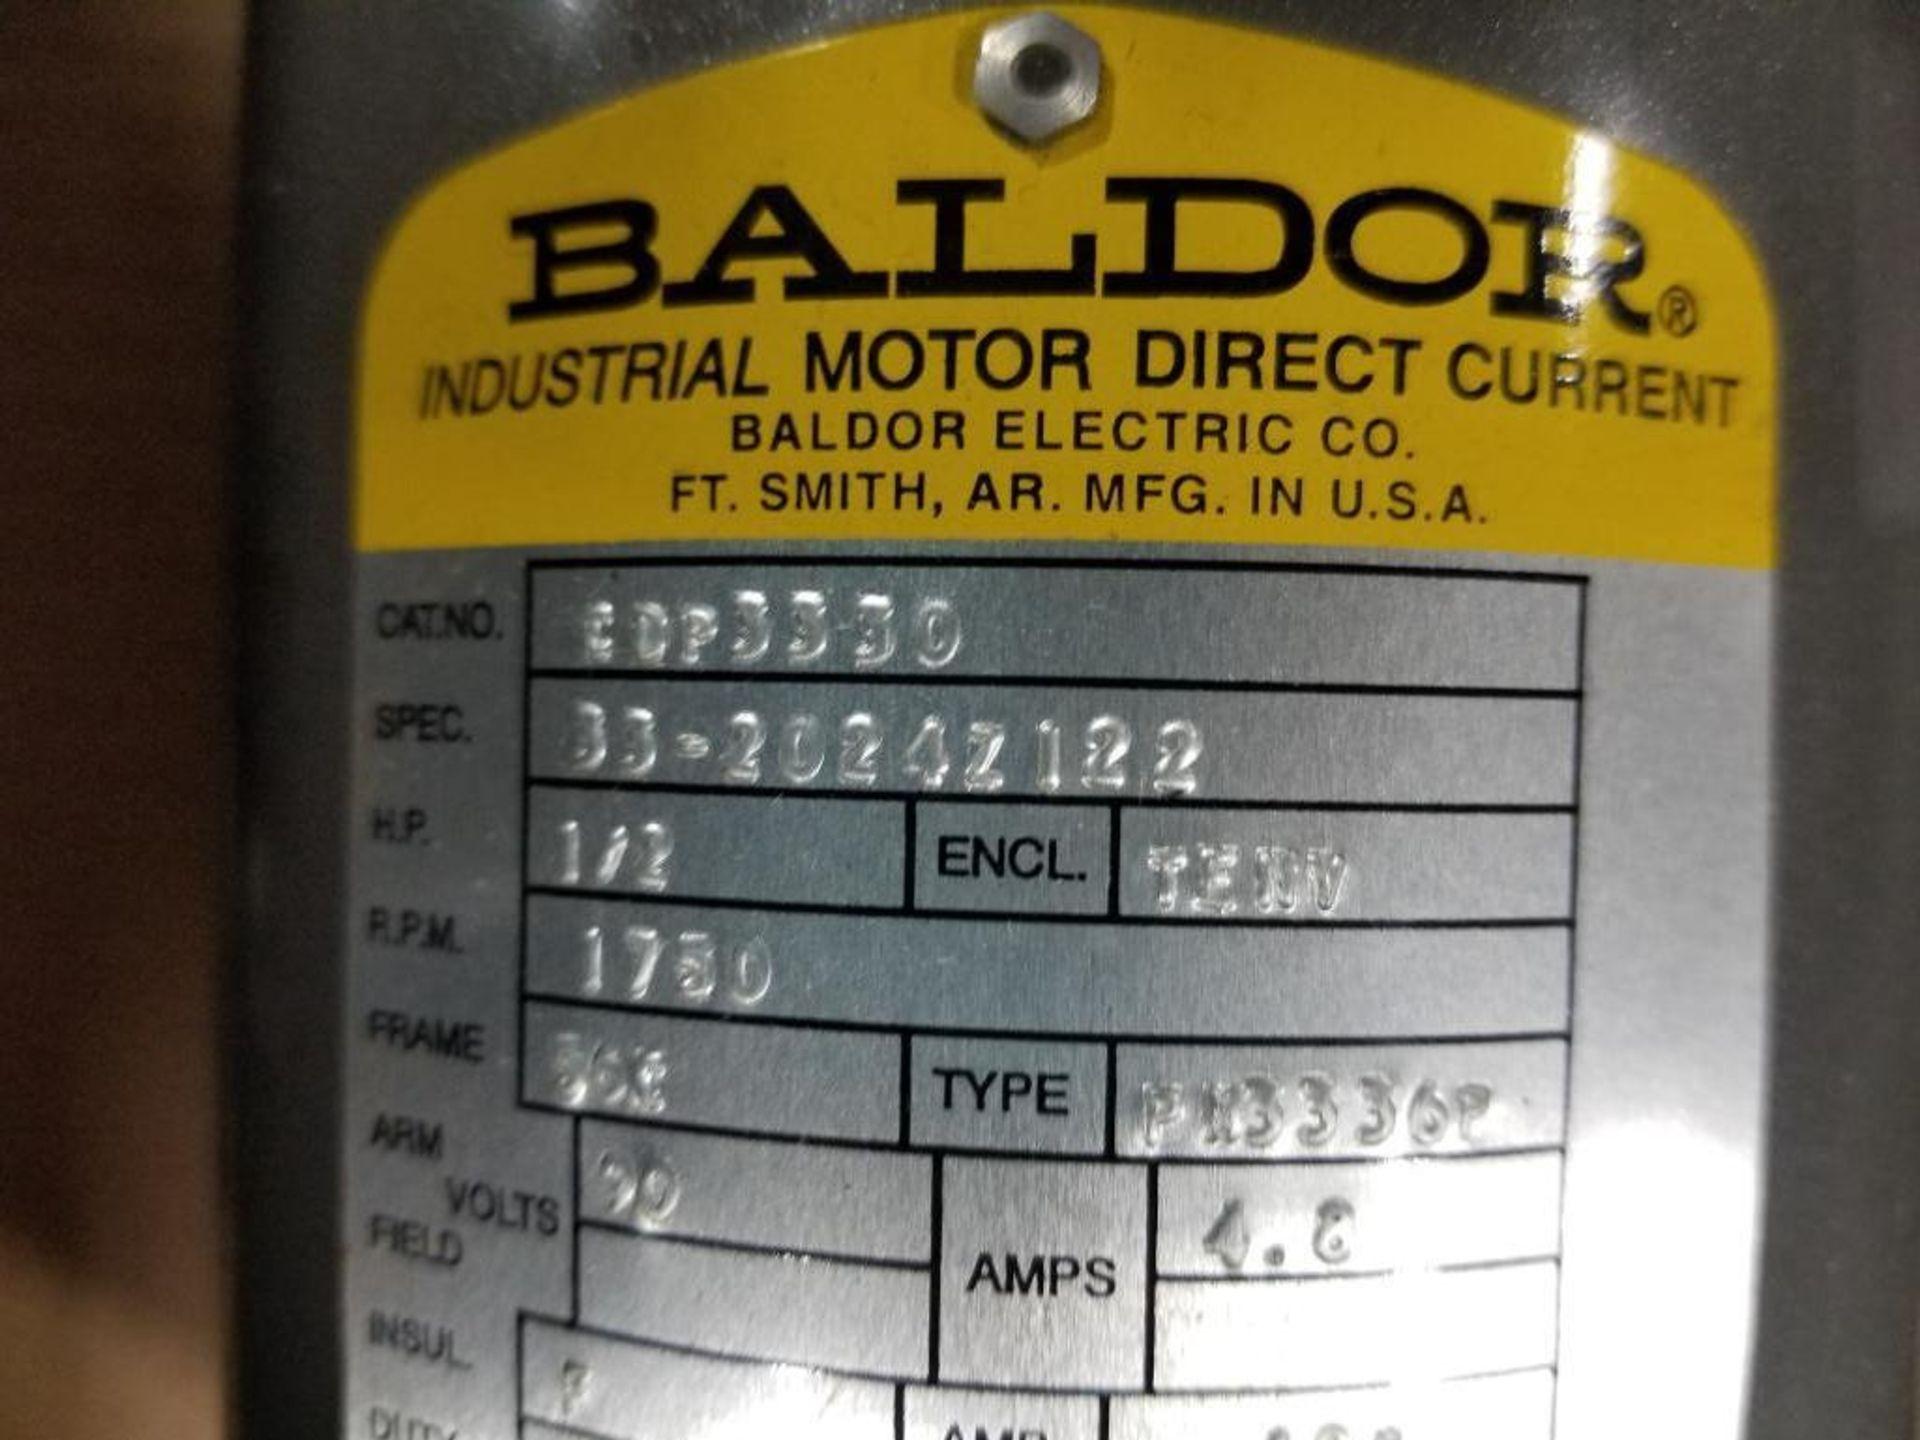 1/2HP Baldor industrial motor COP3330, 33-2024Z122. 1750RPM, 56C-Frame. - Image 2 of 6